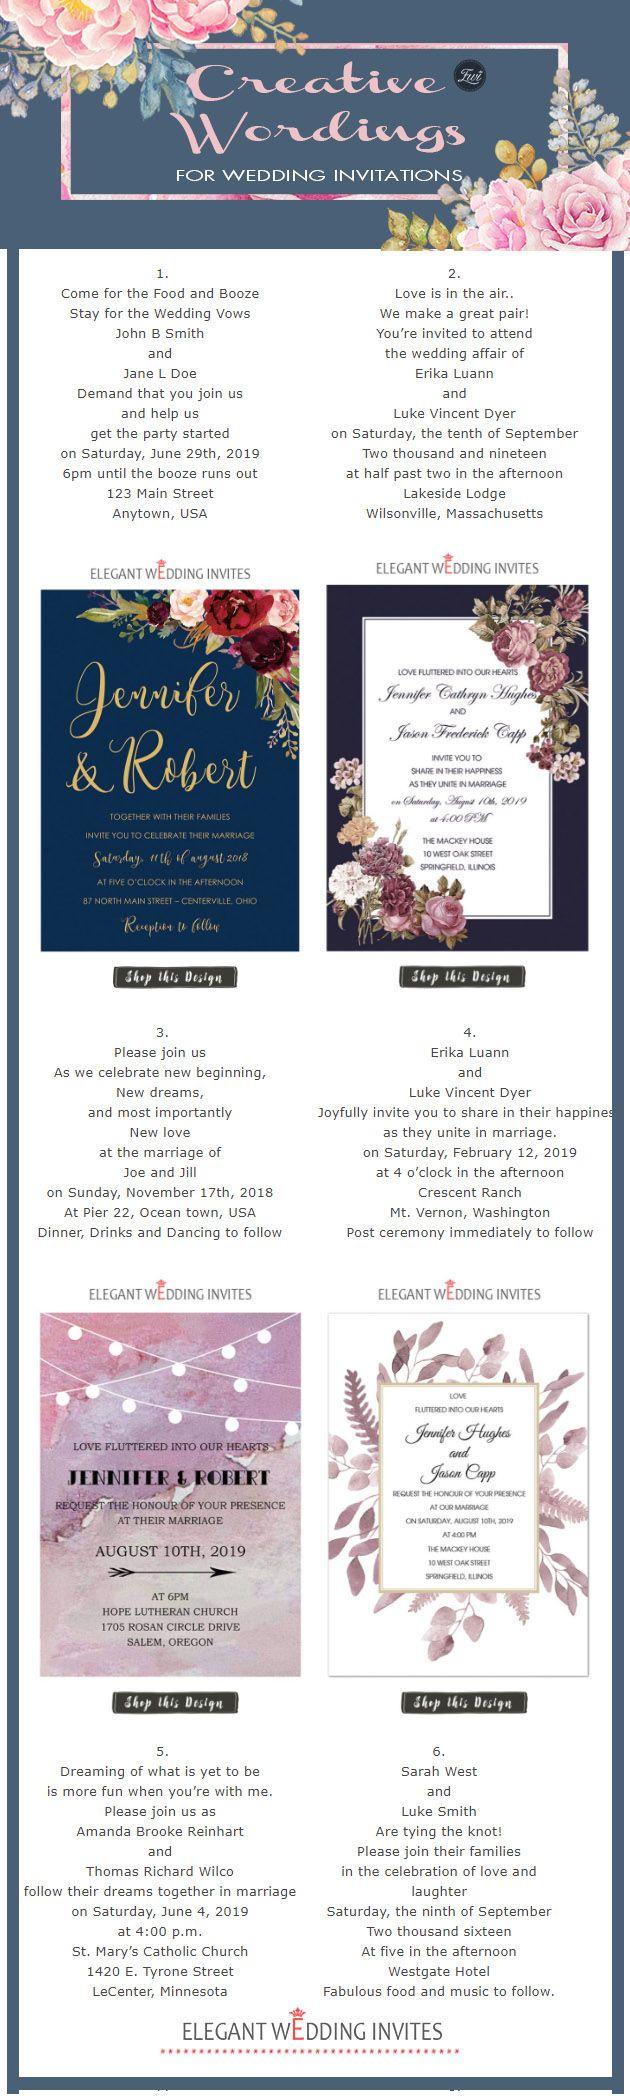 Outside fall wedding decorations february 2019  Creative Wedding Invitation Wordings to Inspire  Wedding